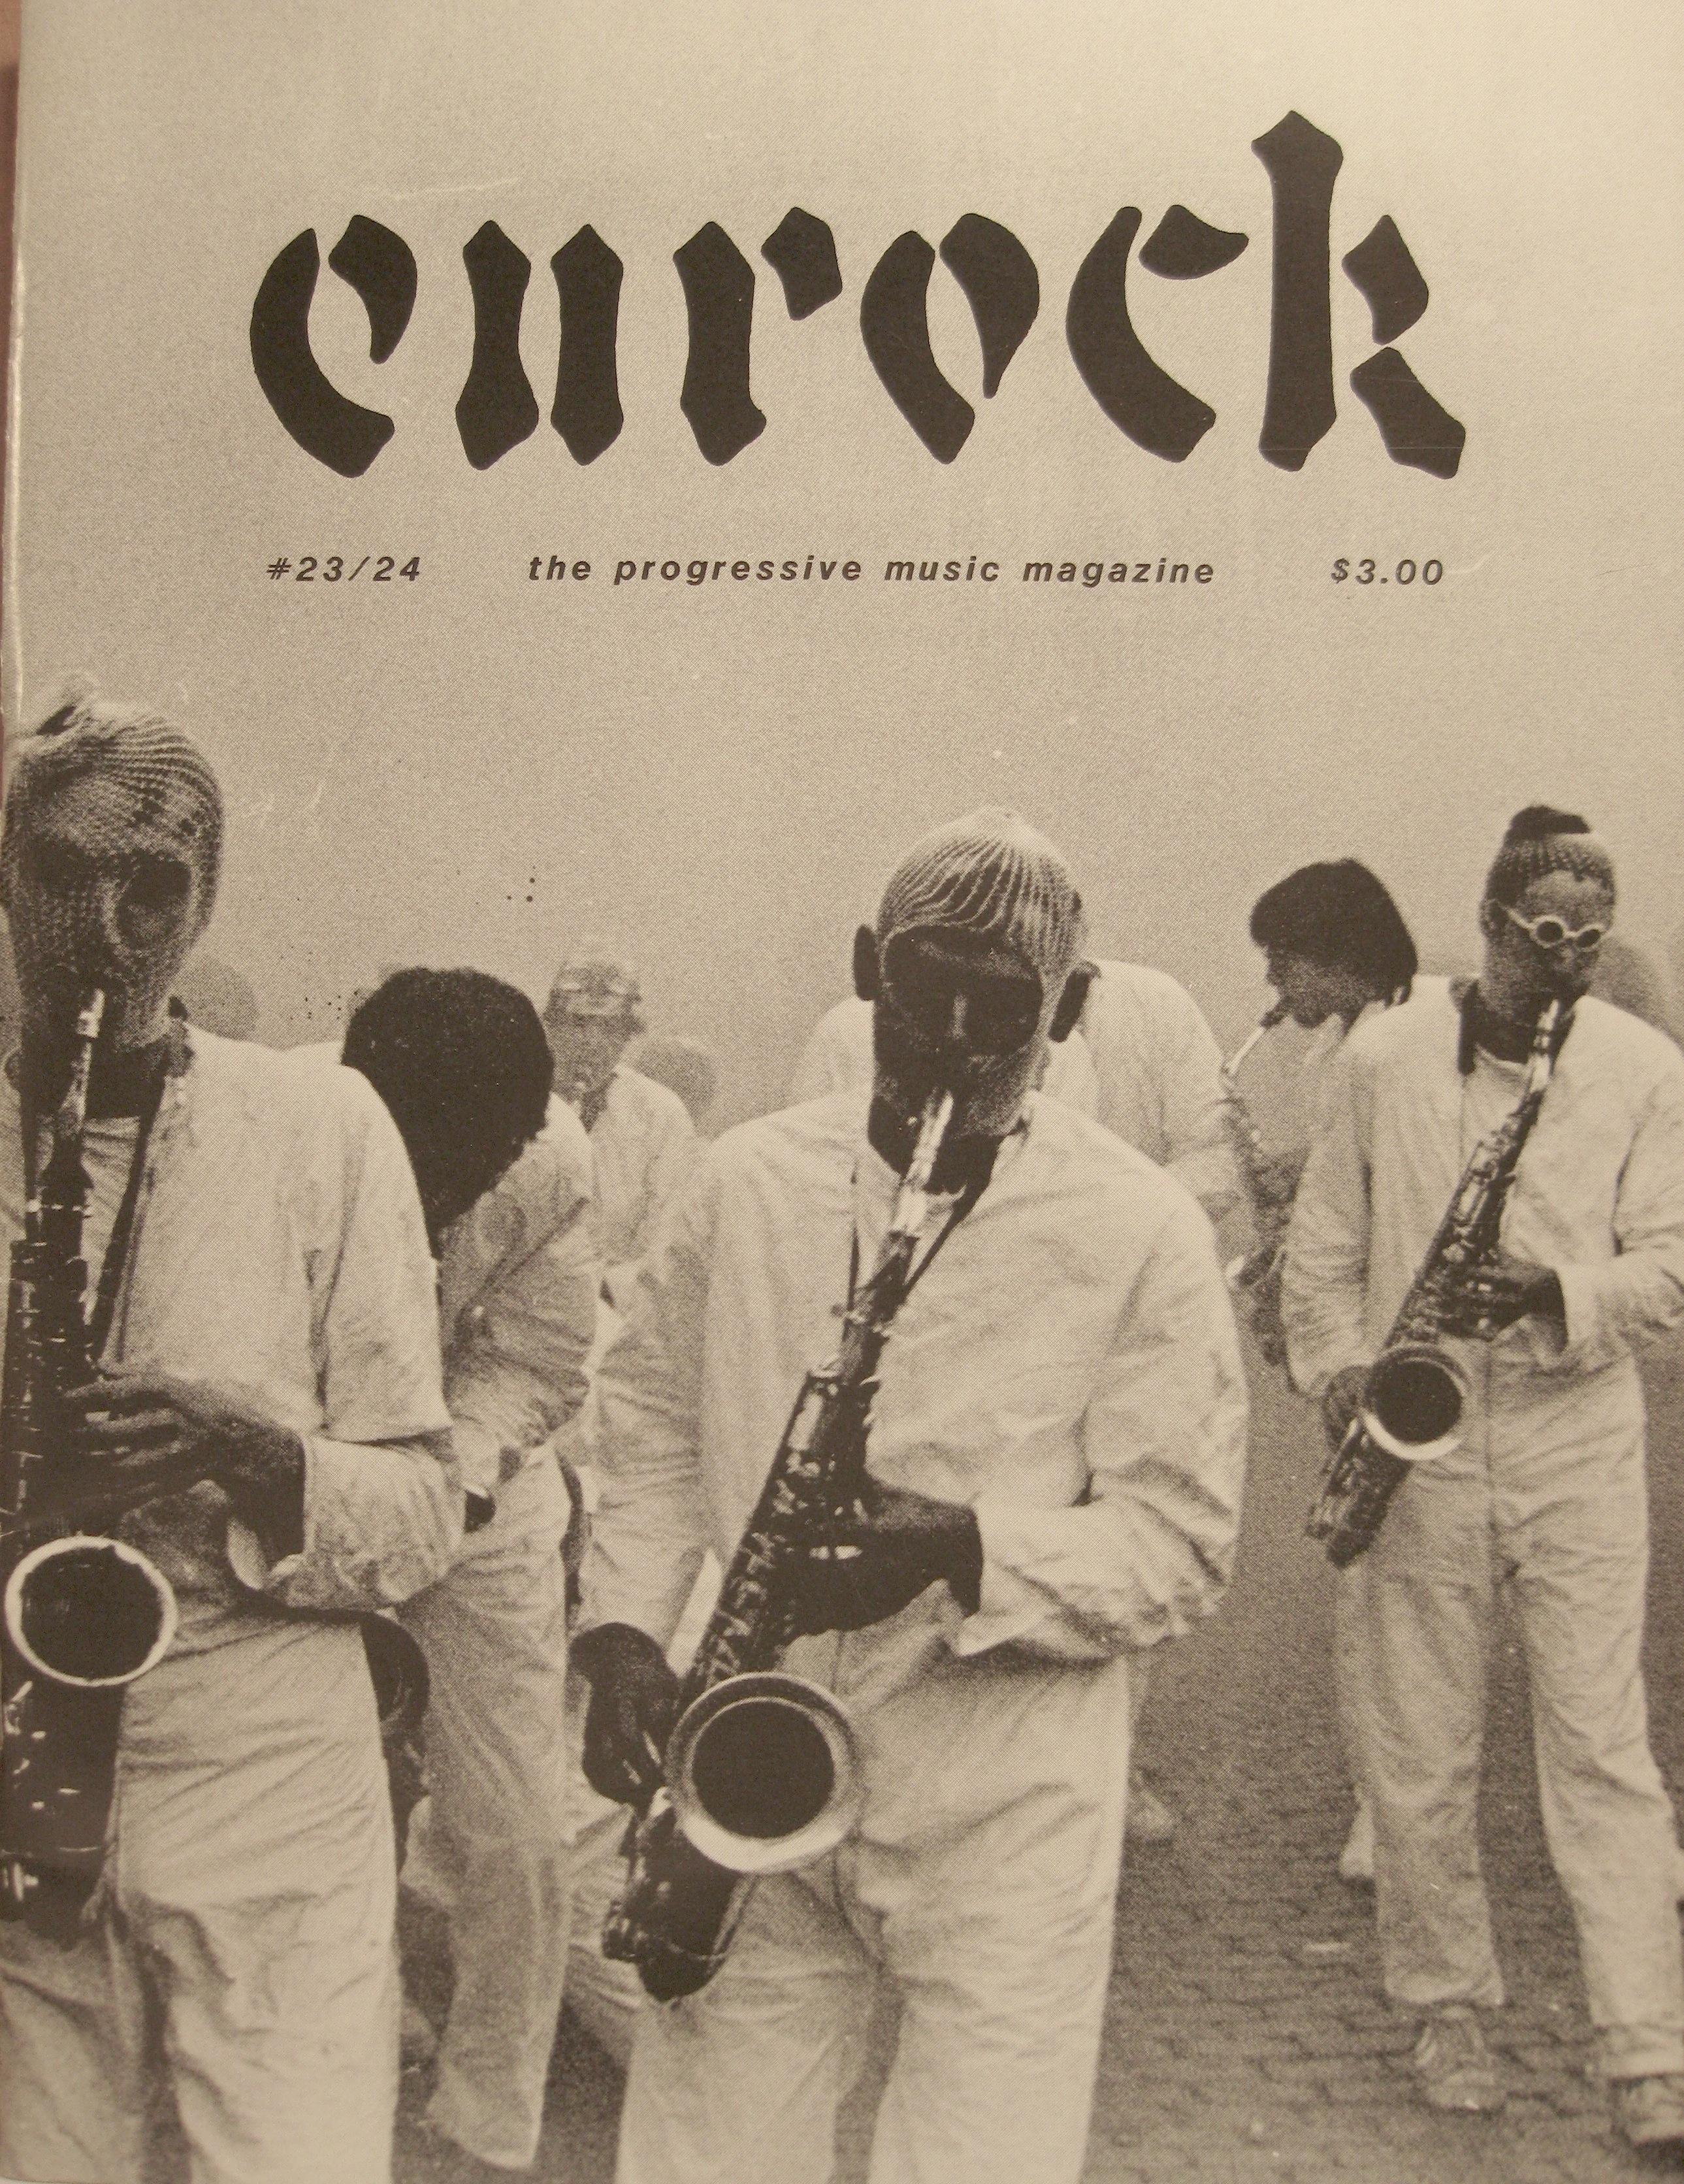 Eurock_saxophones_edit